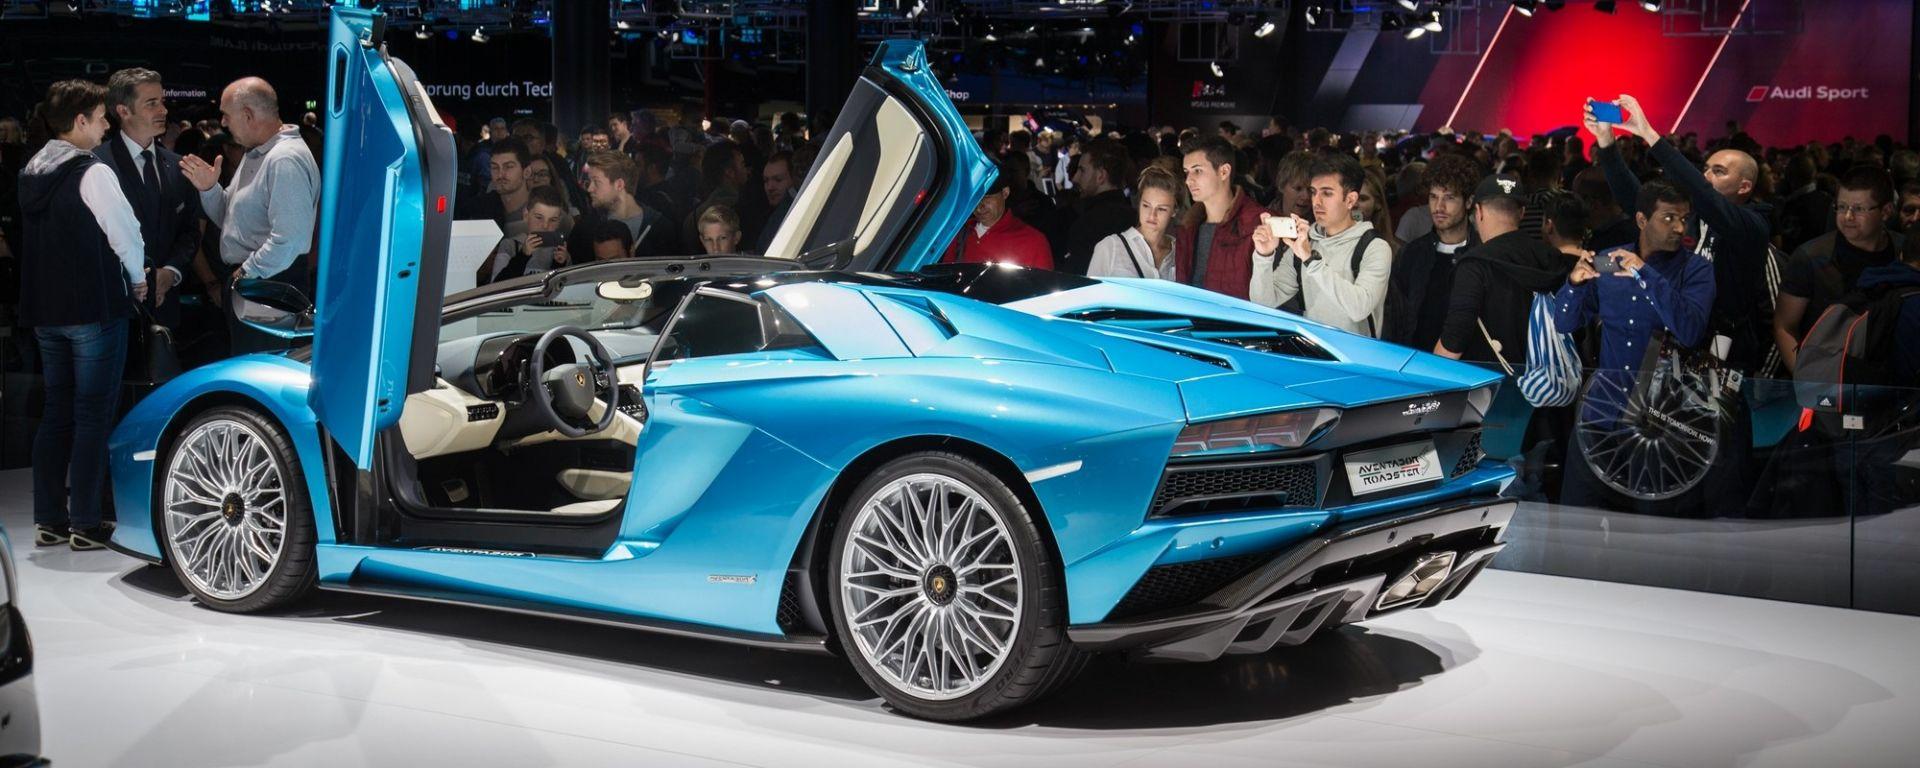 Lamborghini Aventador S Roadster: 740 CV a cielo aperto